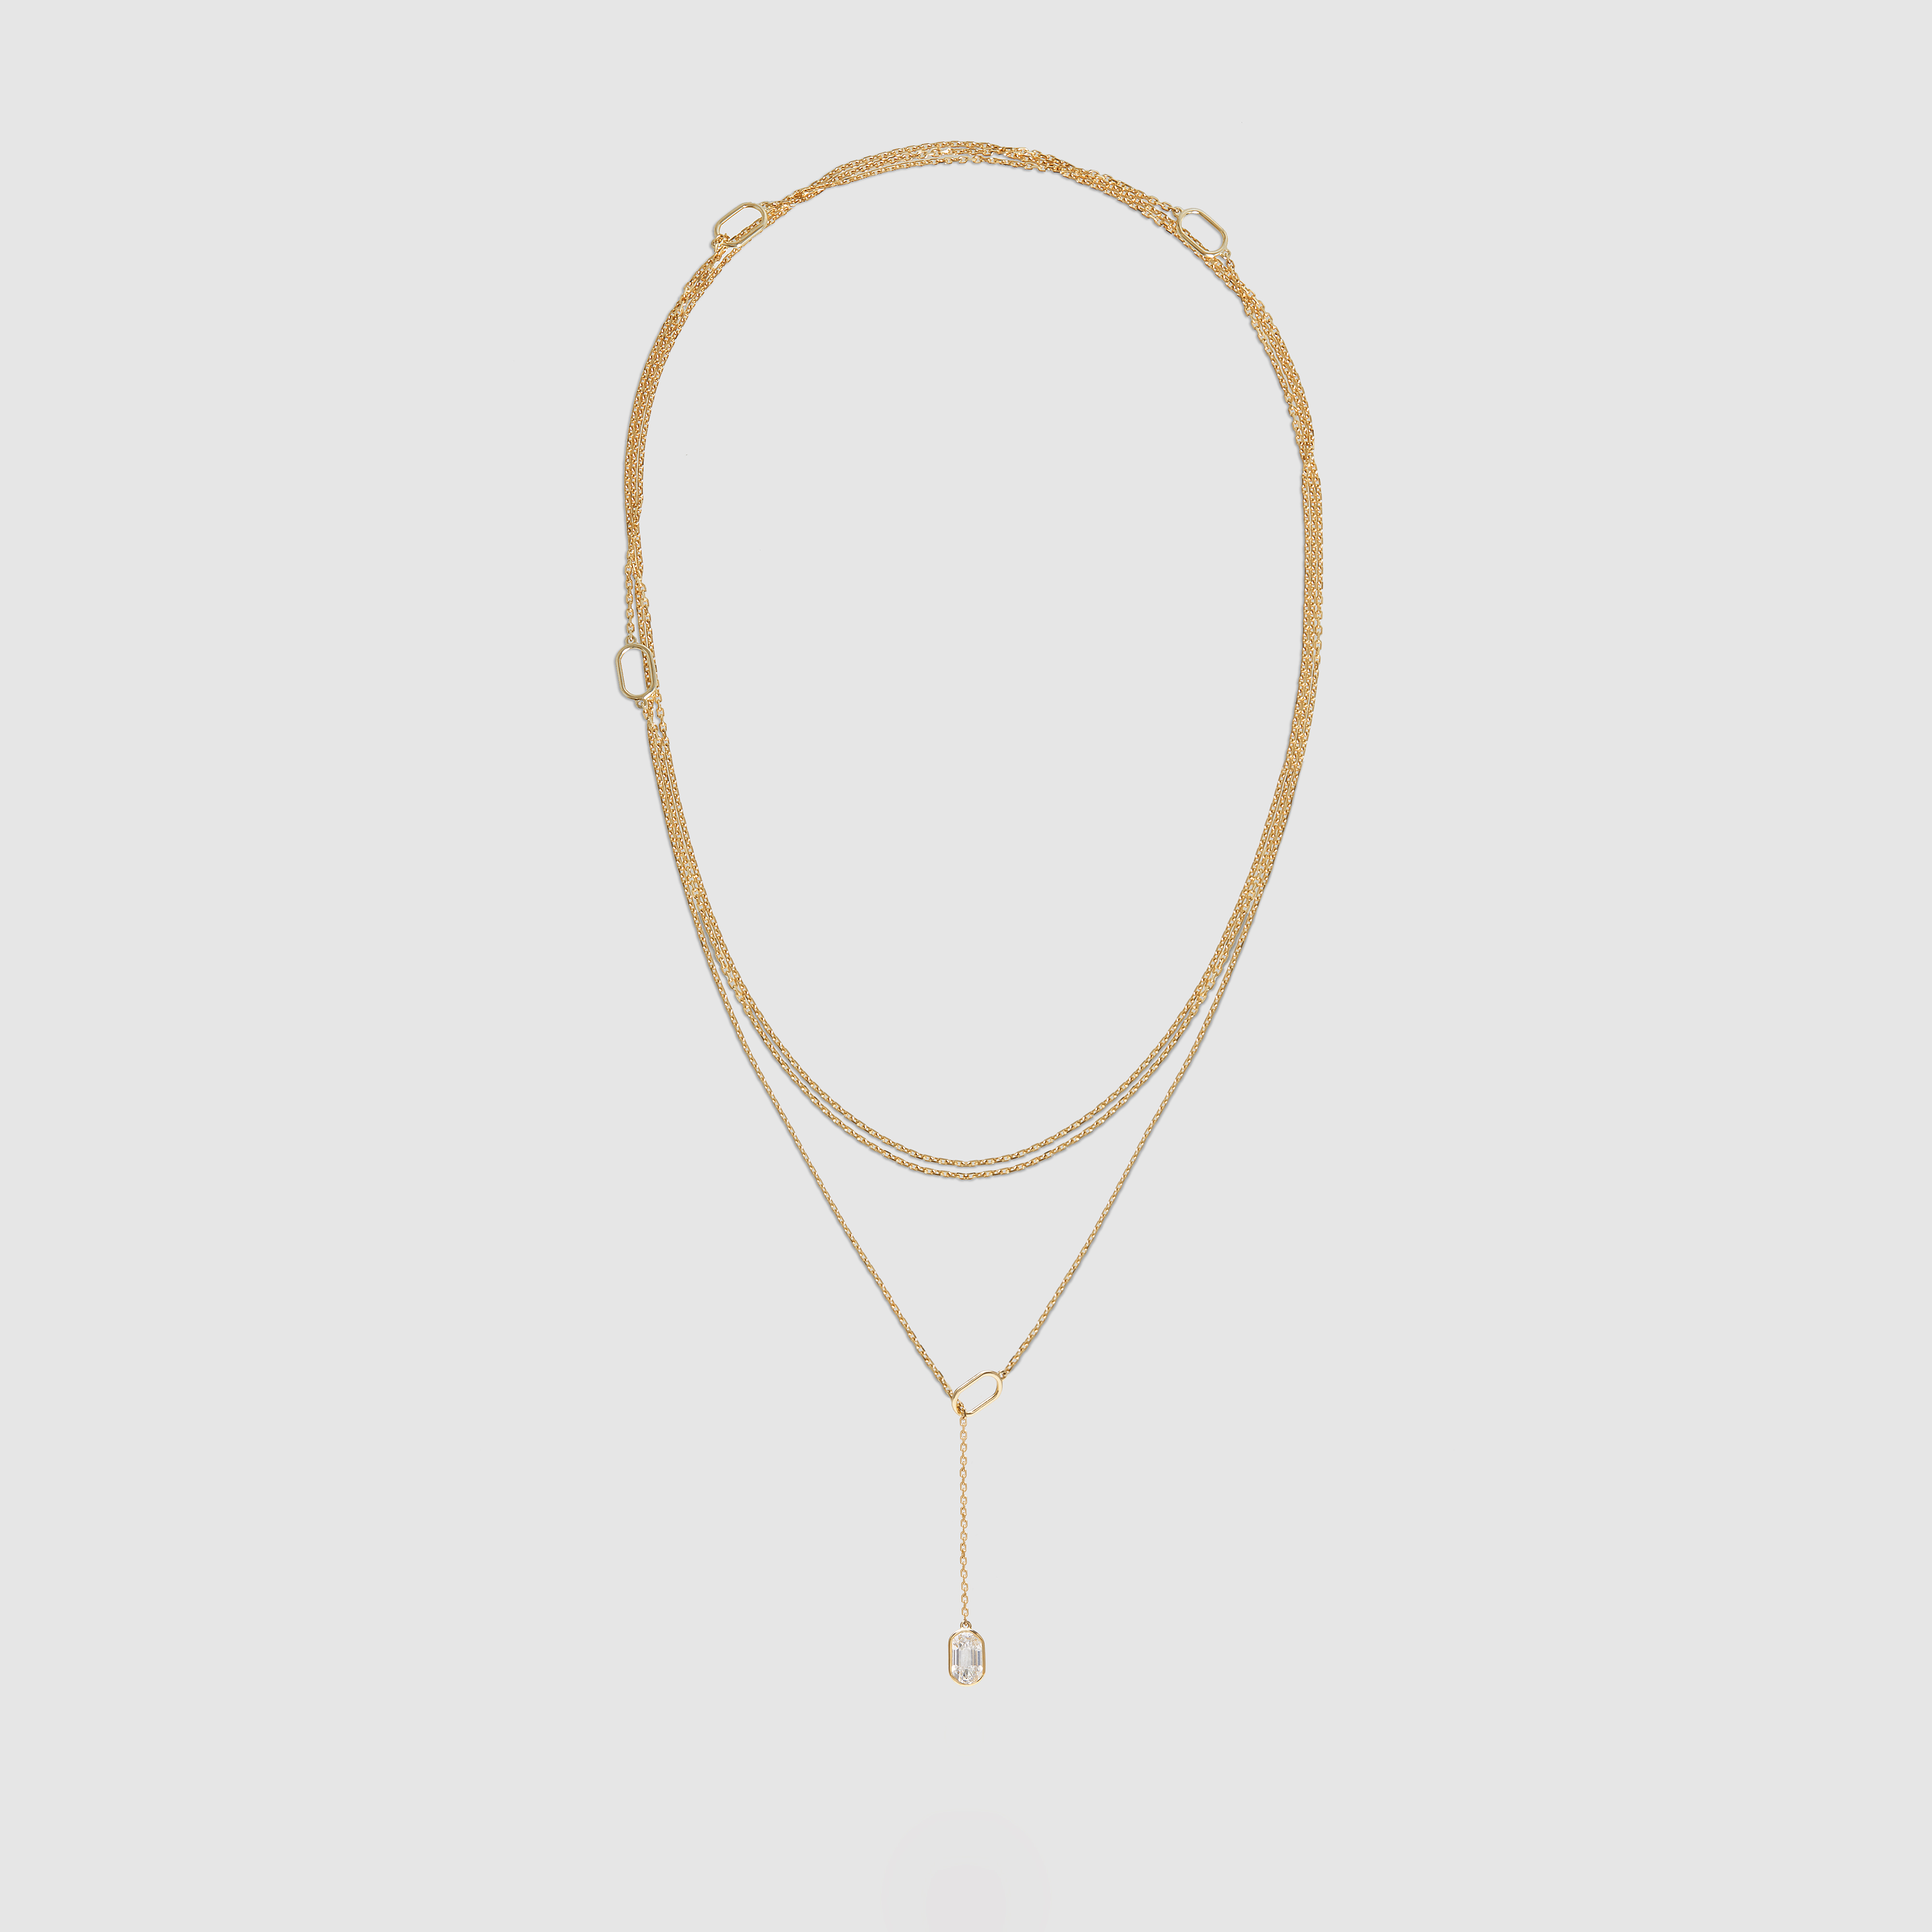 A necklace by Raphaele Canot.